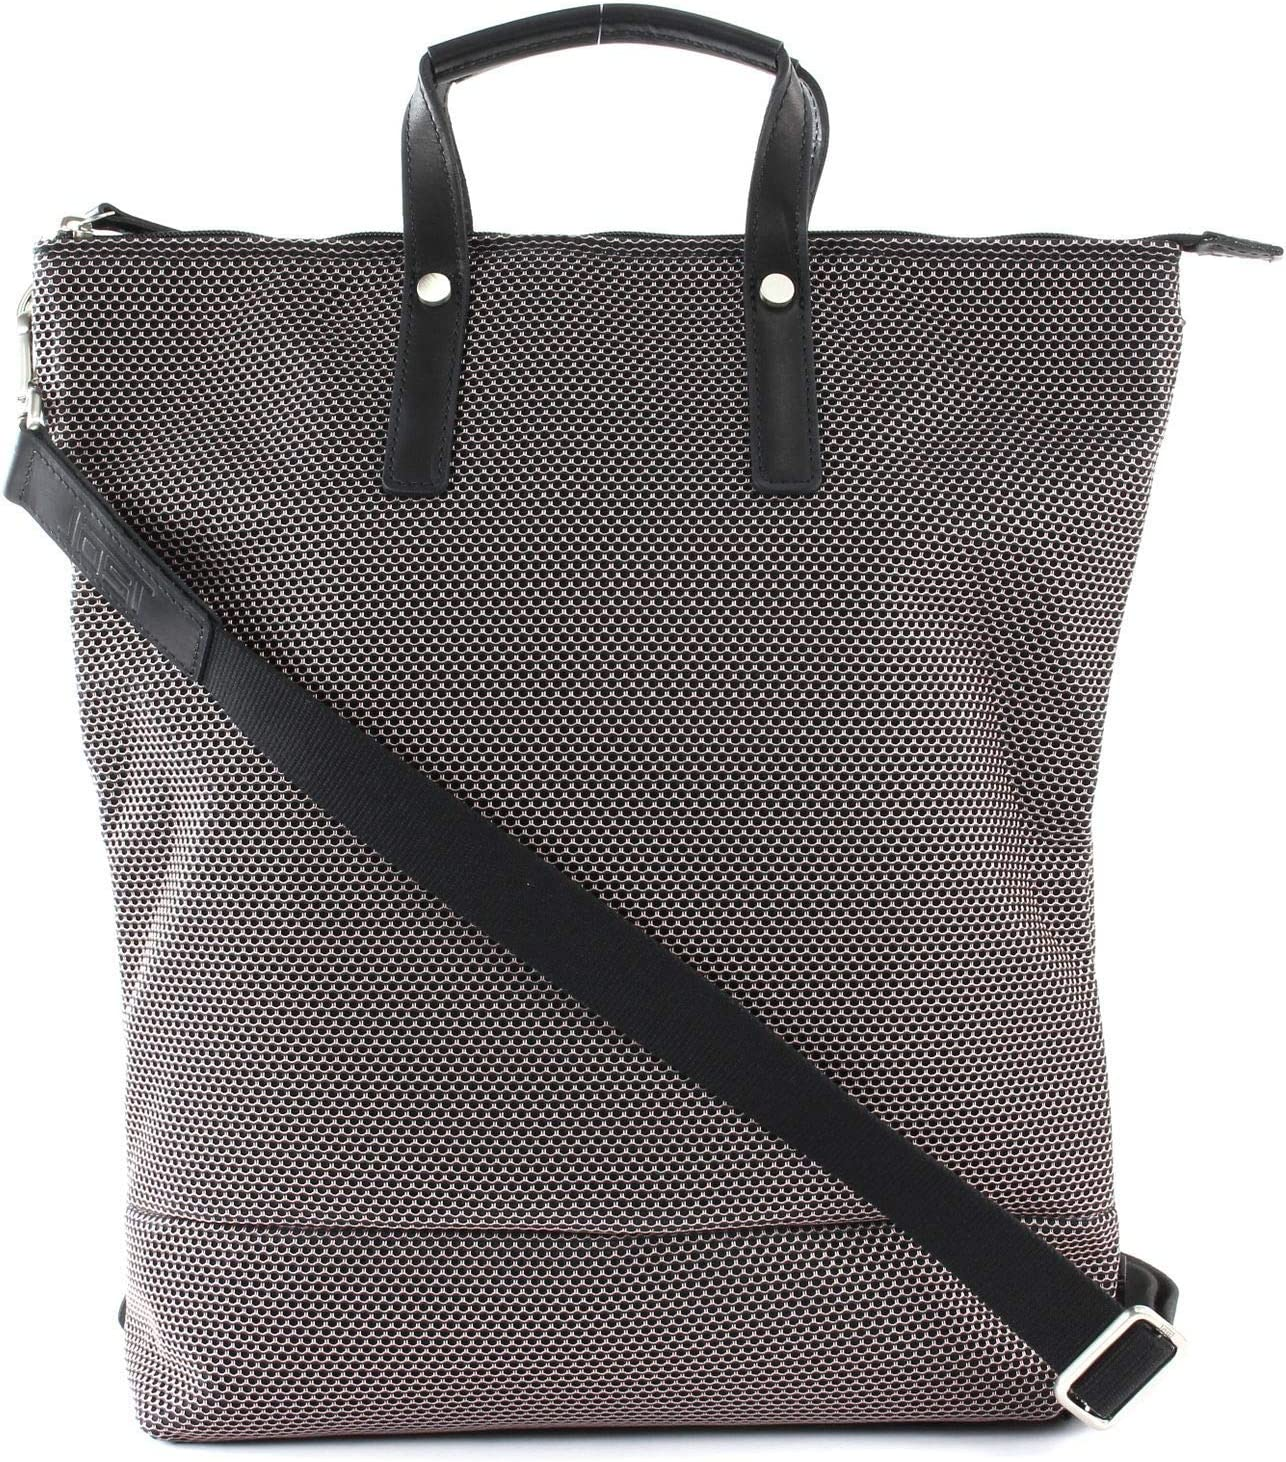 Jost Kopenhagen X-Change 3-Way-Bag S Zaino, 14,4 Litri, Colore Nero Rosewood haxDI